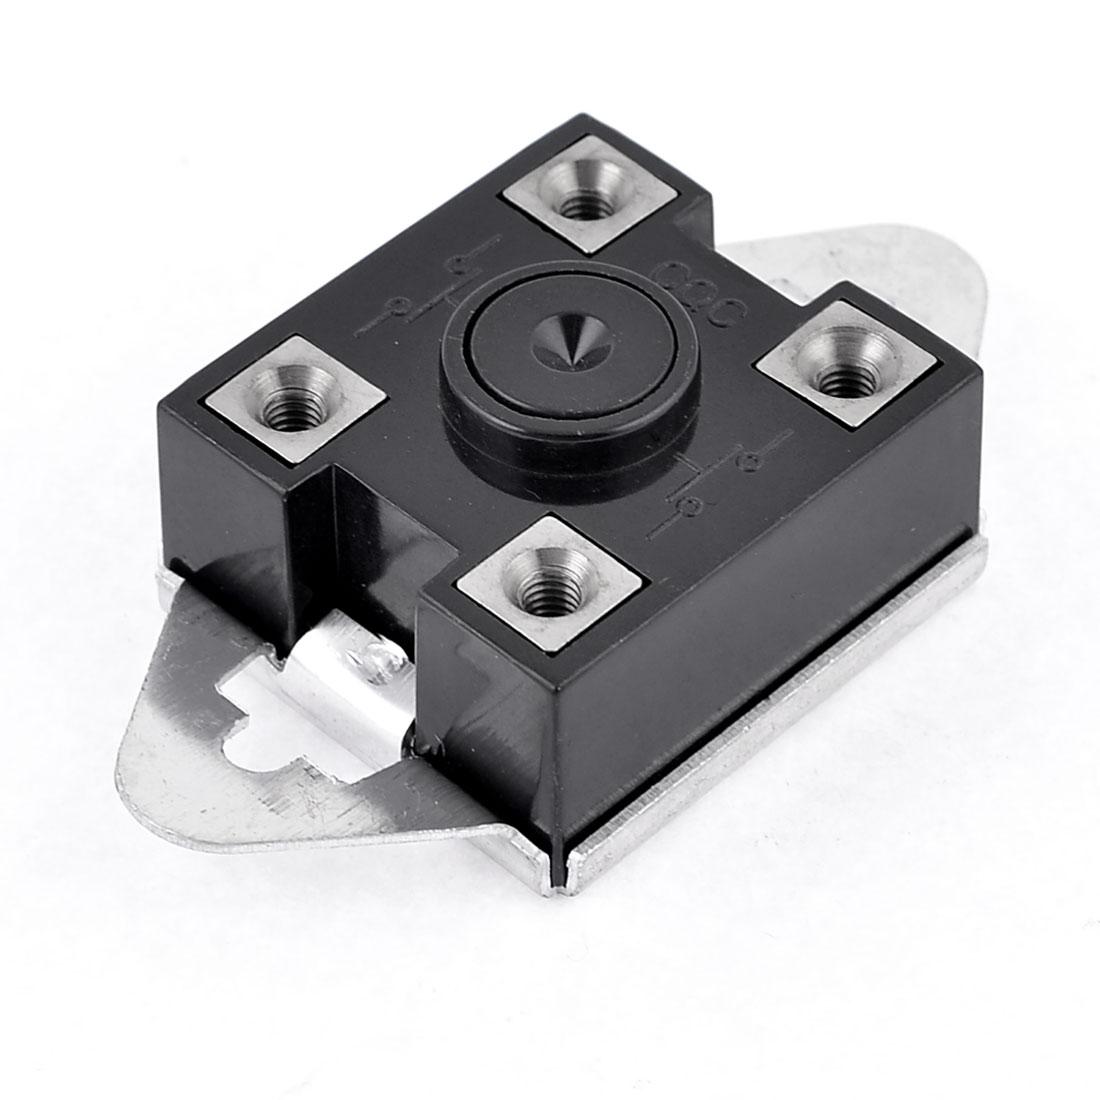 95 Celsius N/C KSD307 Model Temperature Controller Thermostat AC250V 45A - image 1 of 1